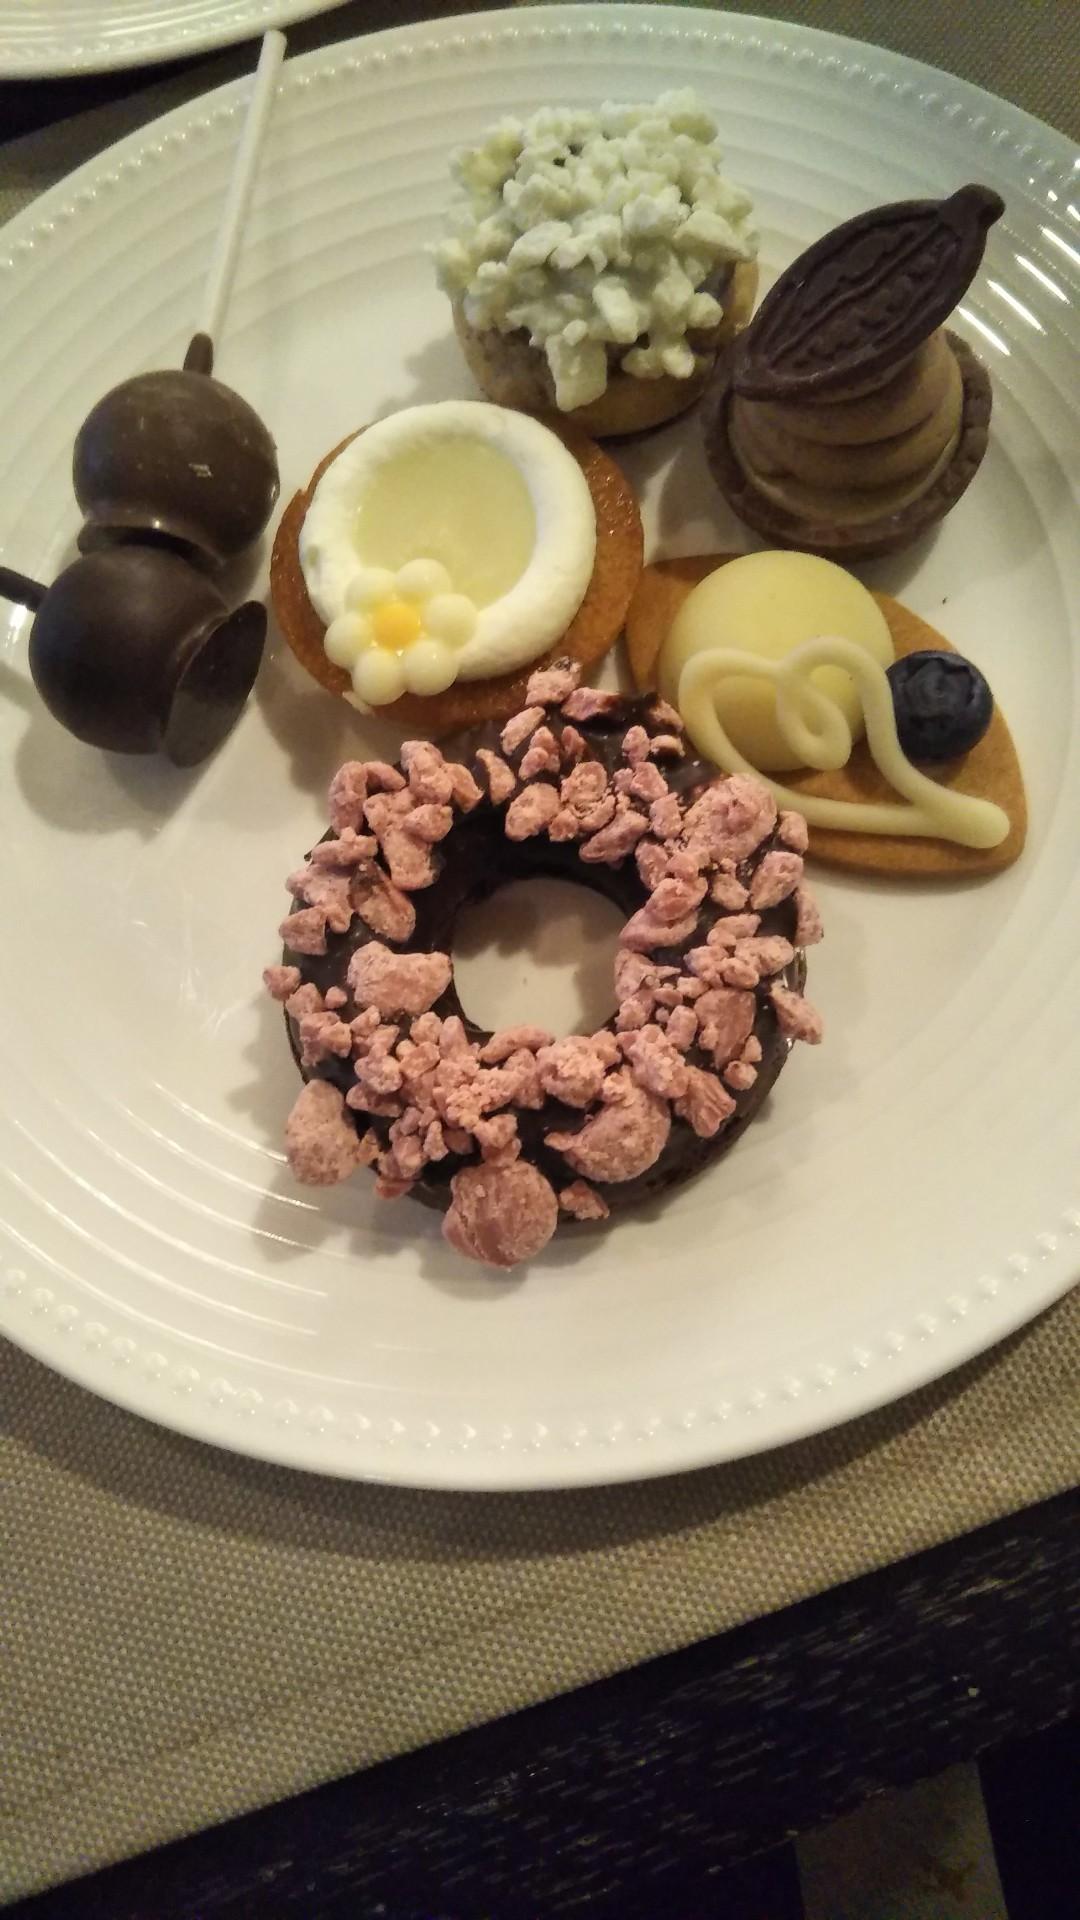 ANAインターコンチネンタルホテル東京 シャンパン・バー チョコレート・スイーツブッフェ_f0076001_22024827.jpg